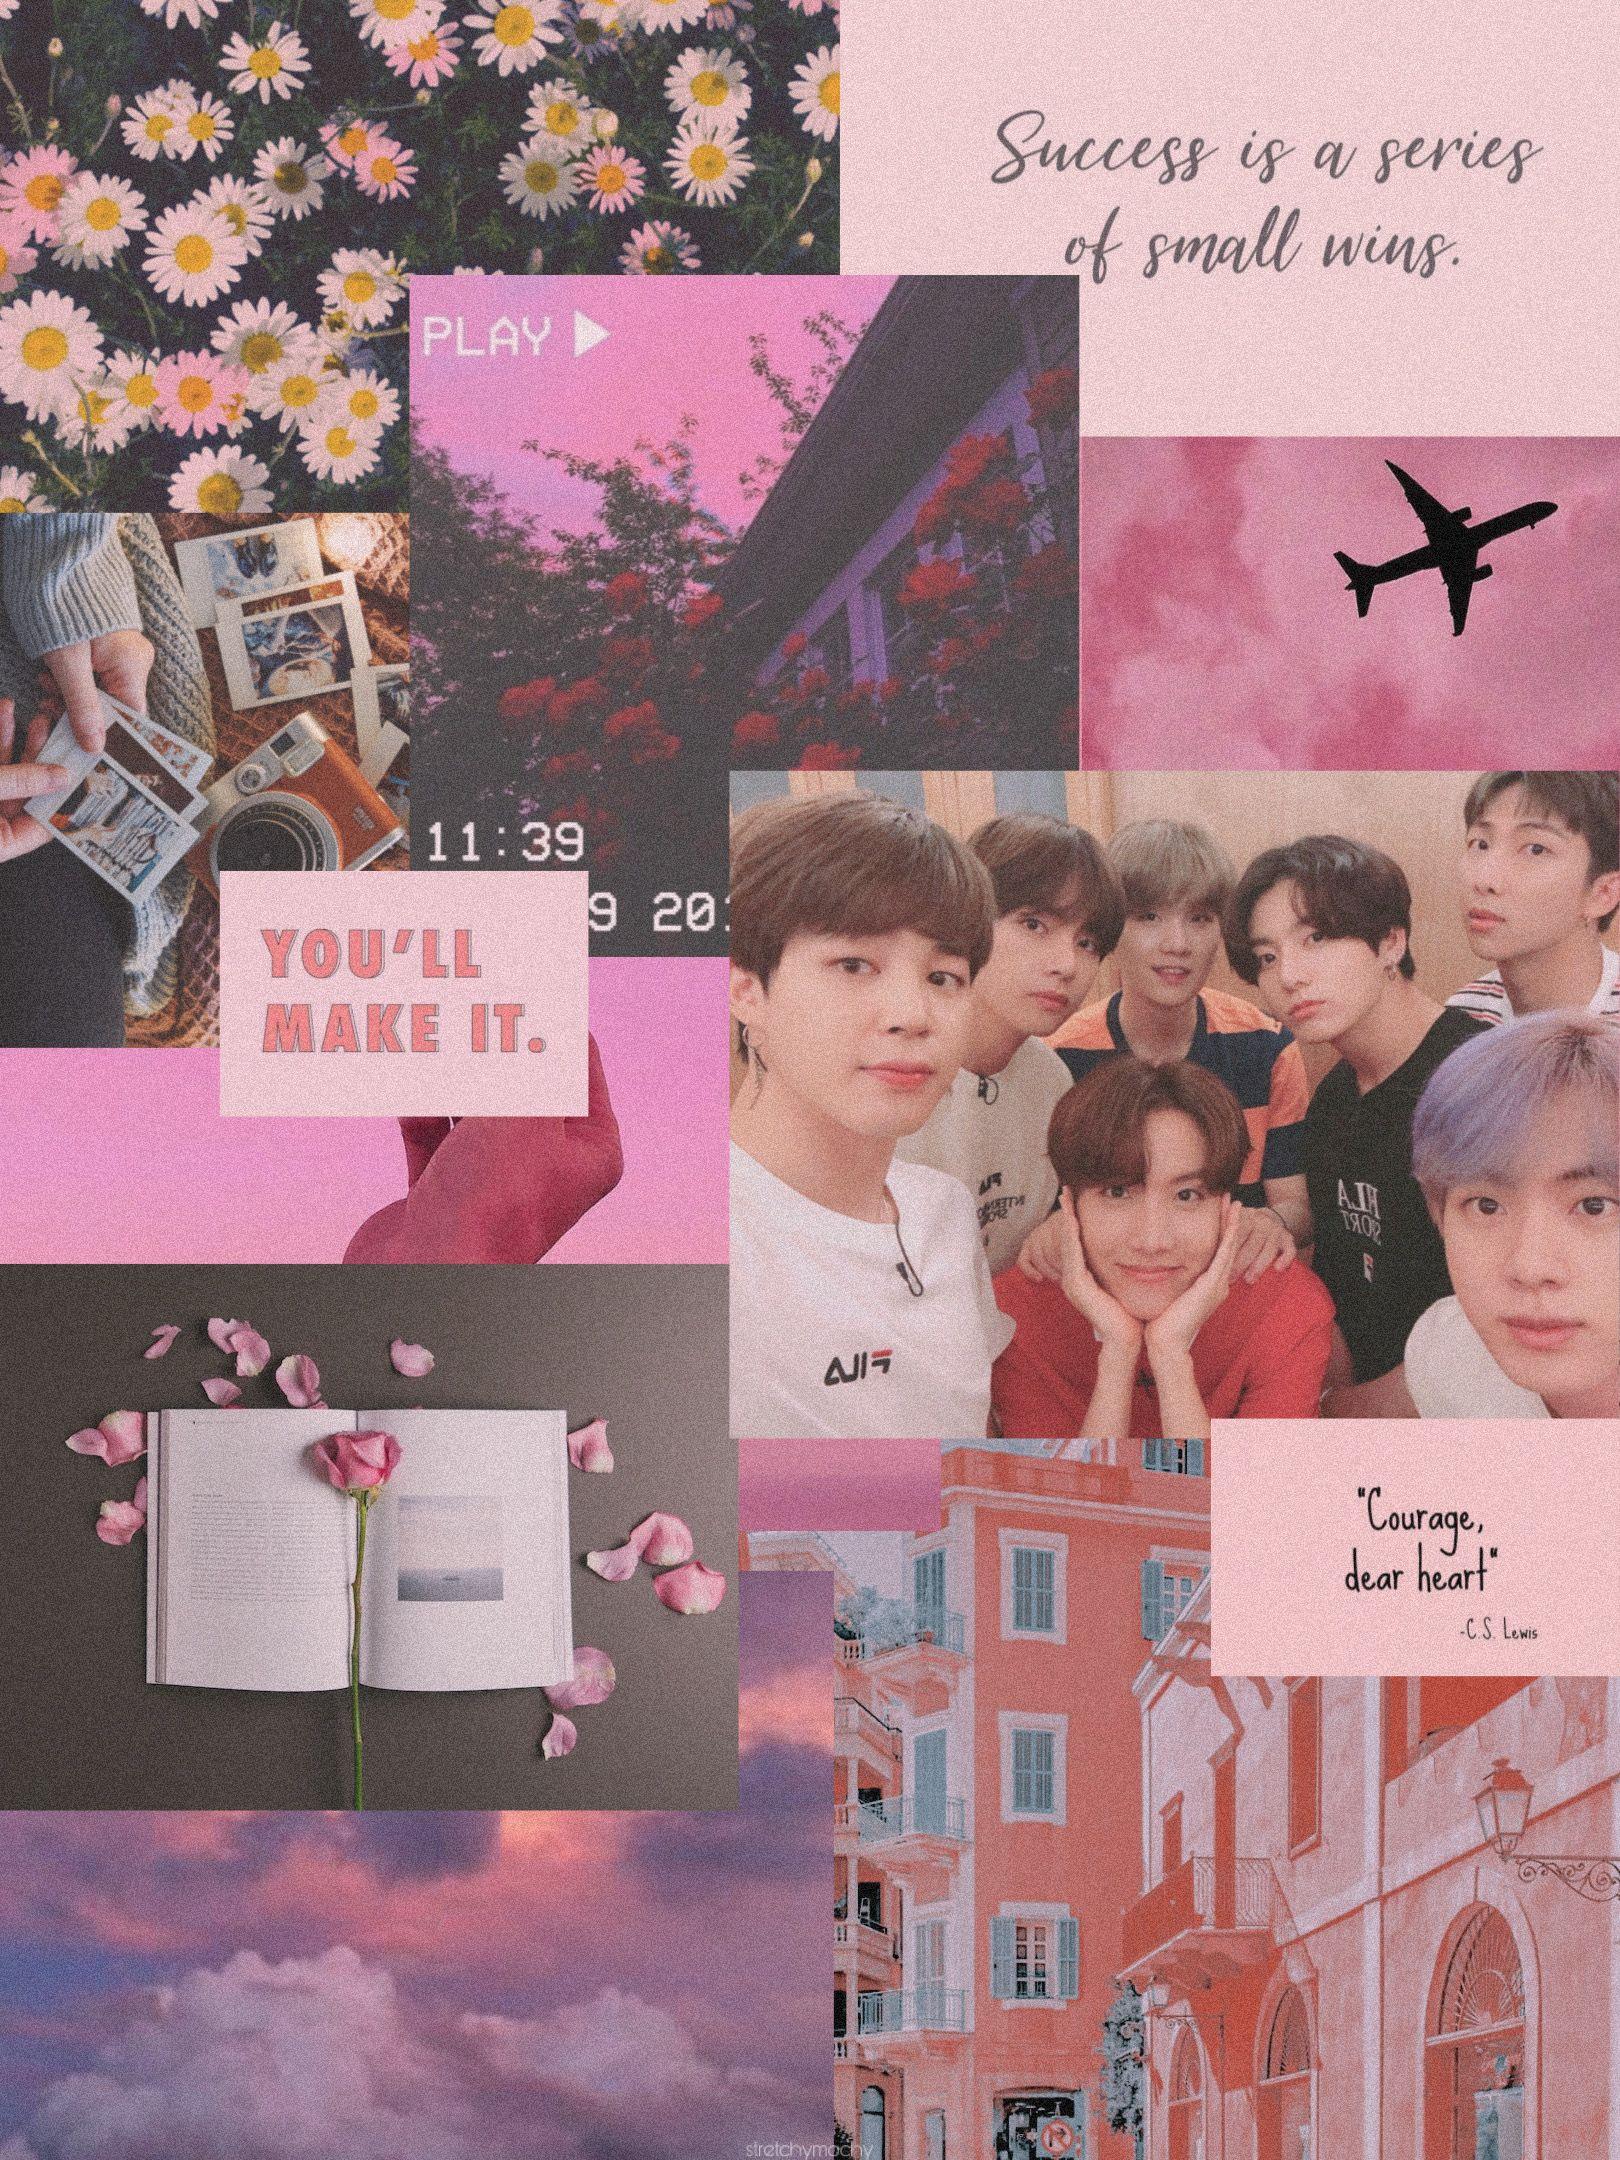 Aesthetic Bts Selca Selfie Ipad Pink Wallpaper Pink Wallpaper Bts Wallpaper Wallpaper Bts aesthetic wallpaper ipad